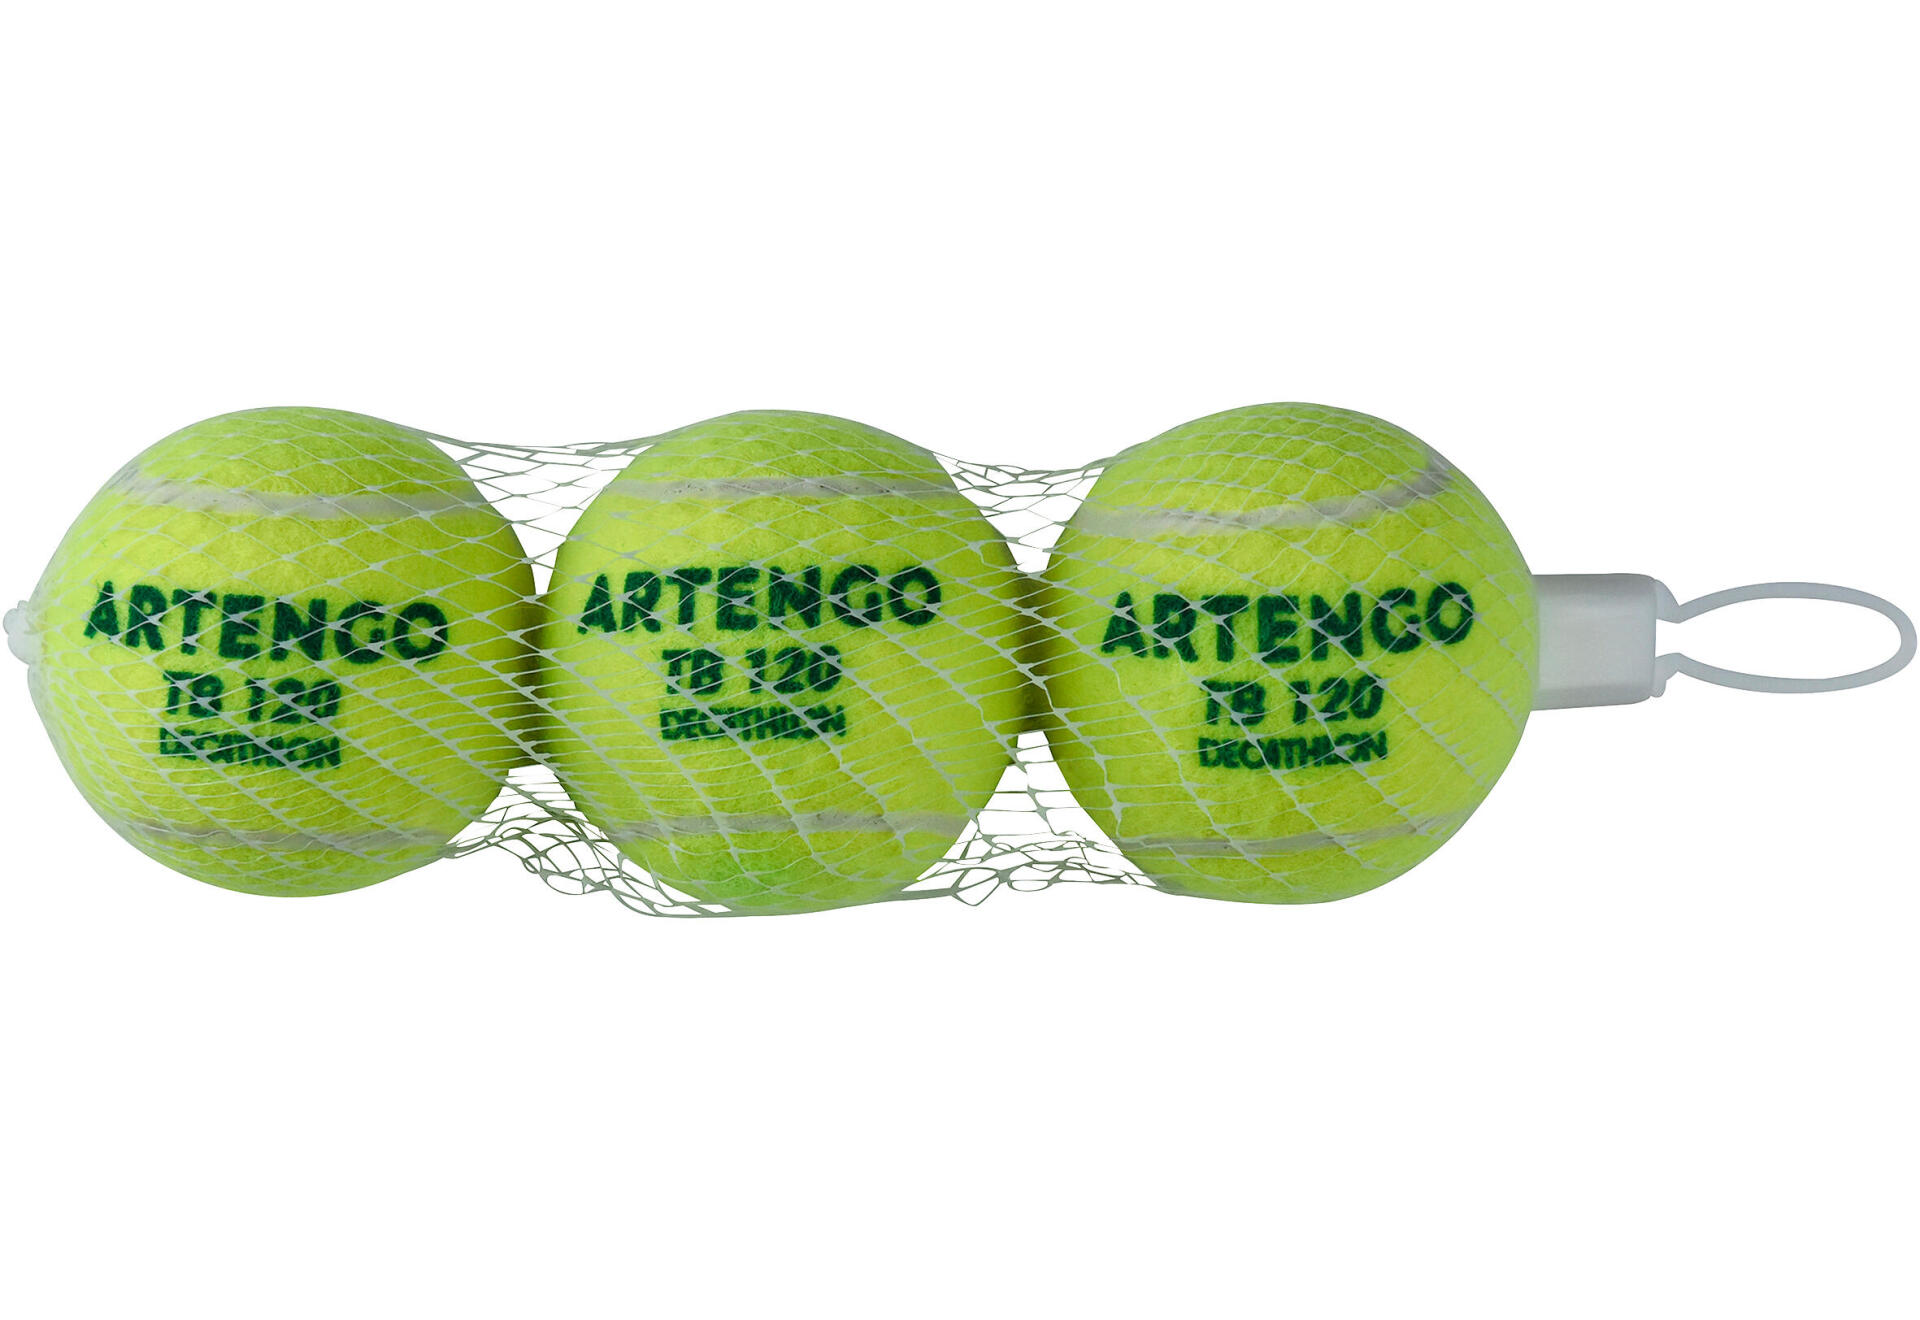 tb120 tennis green pressureless ball in net